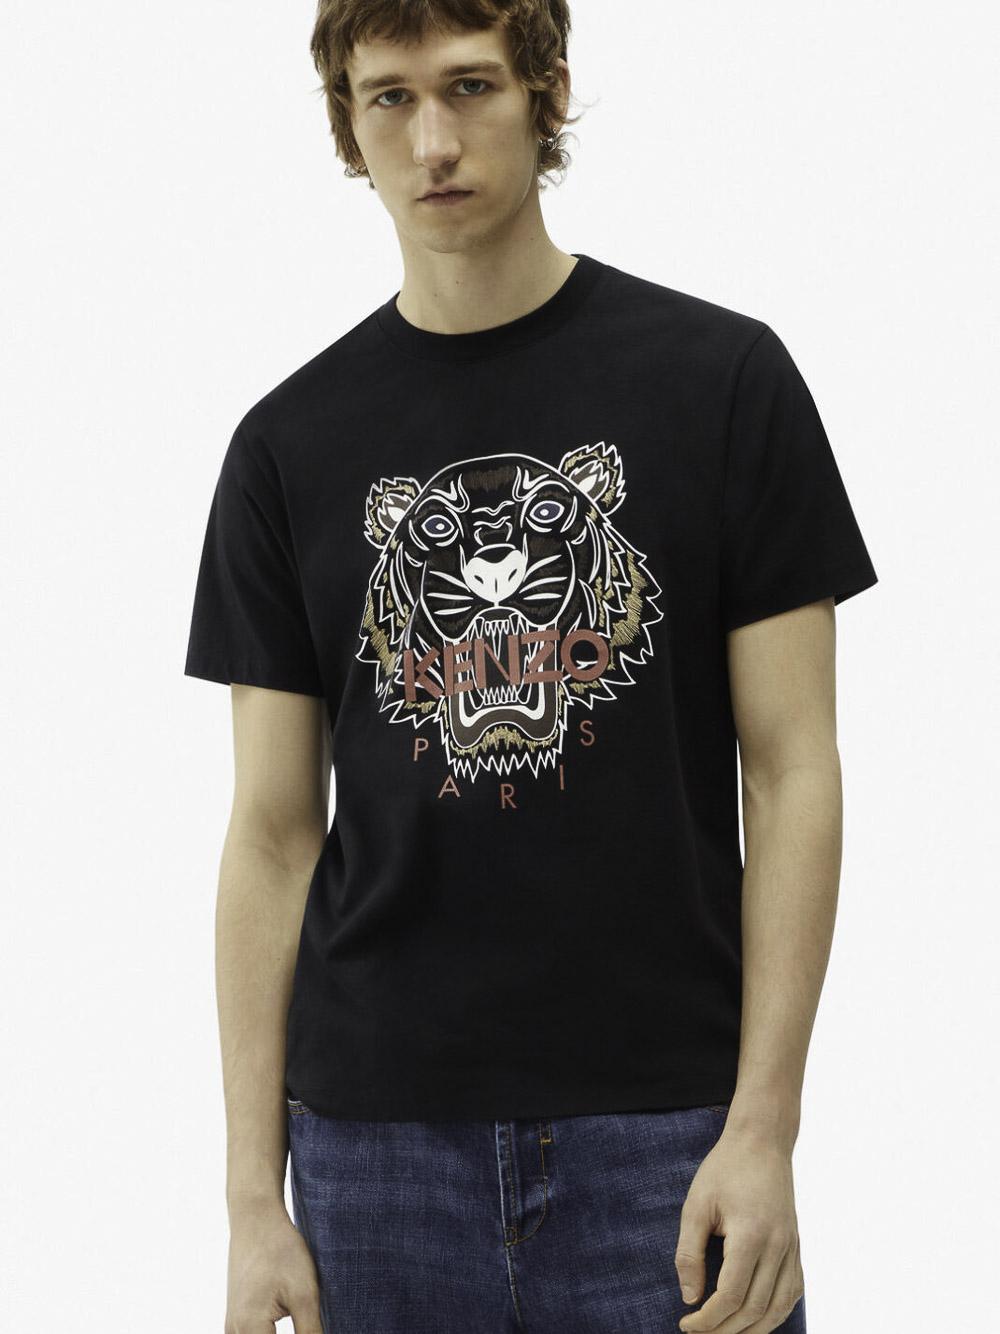 KENZO Μπλούζα t-shirt 5TS0204YA-99 ΜΑΥΡΟ